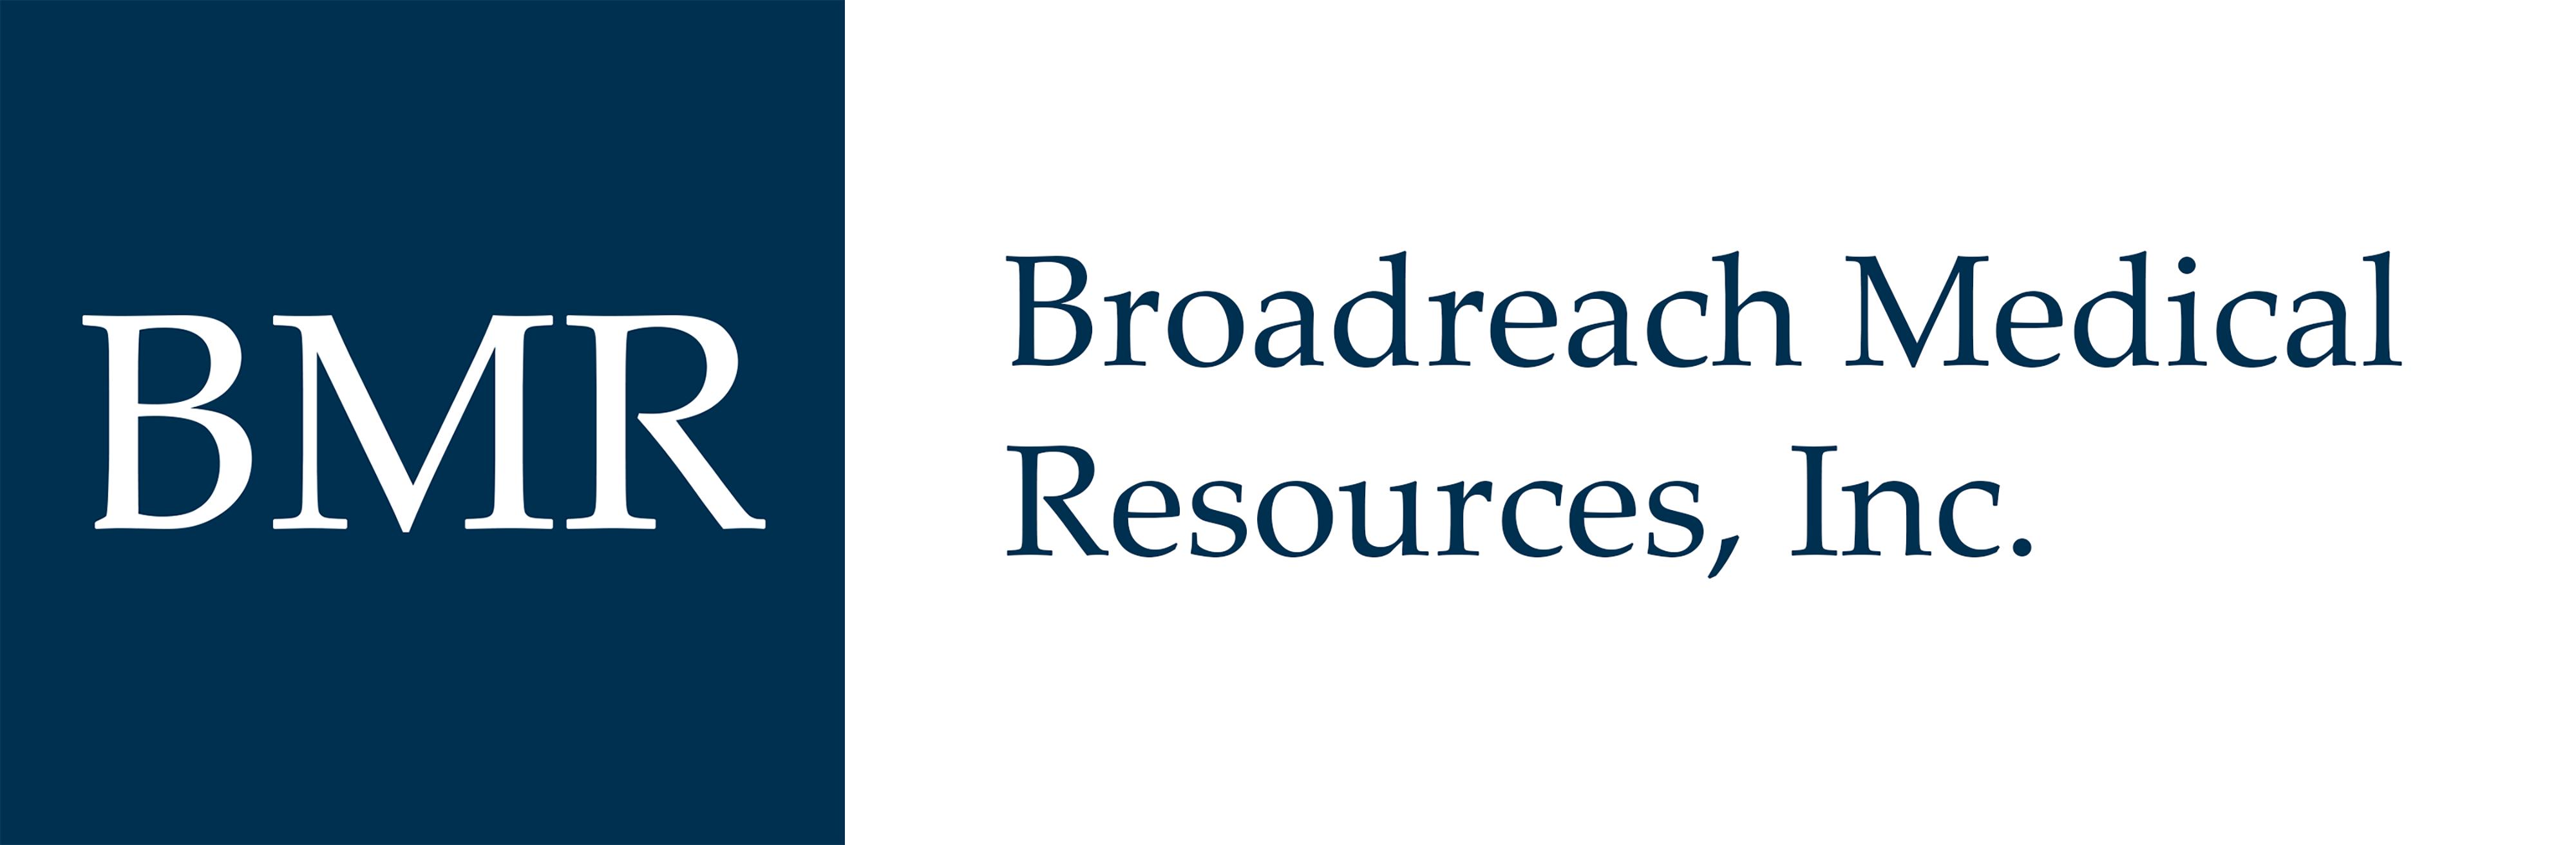 Broadreach Medical Resources, Inc.